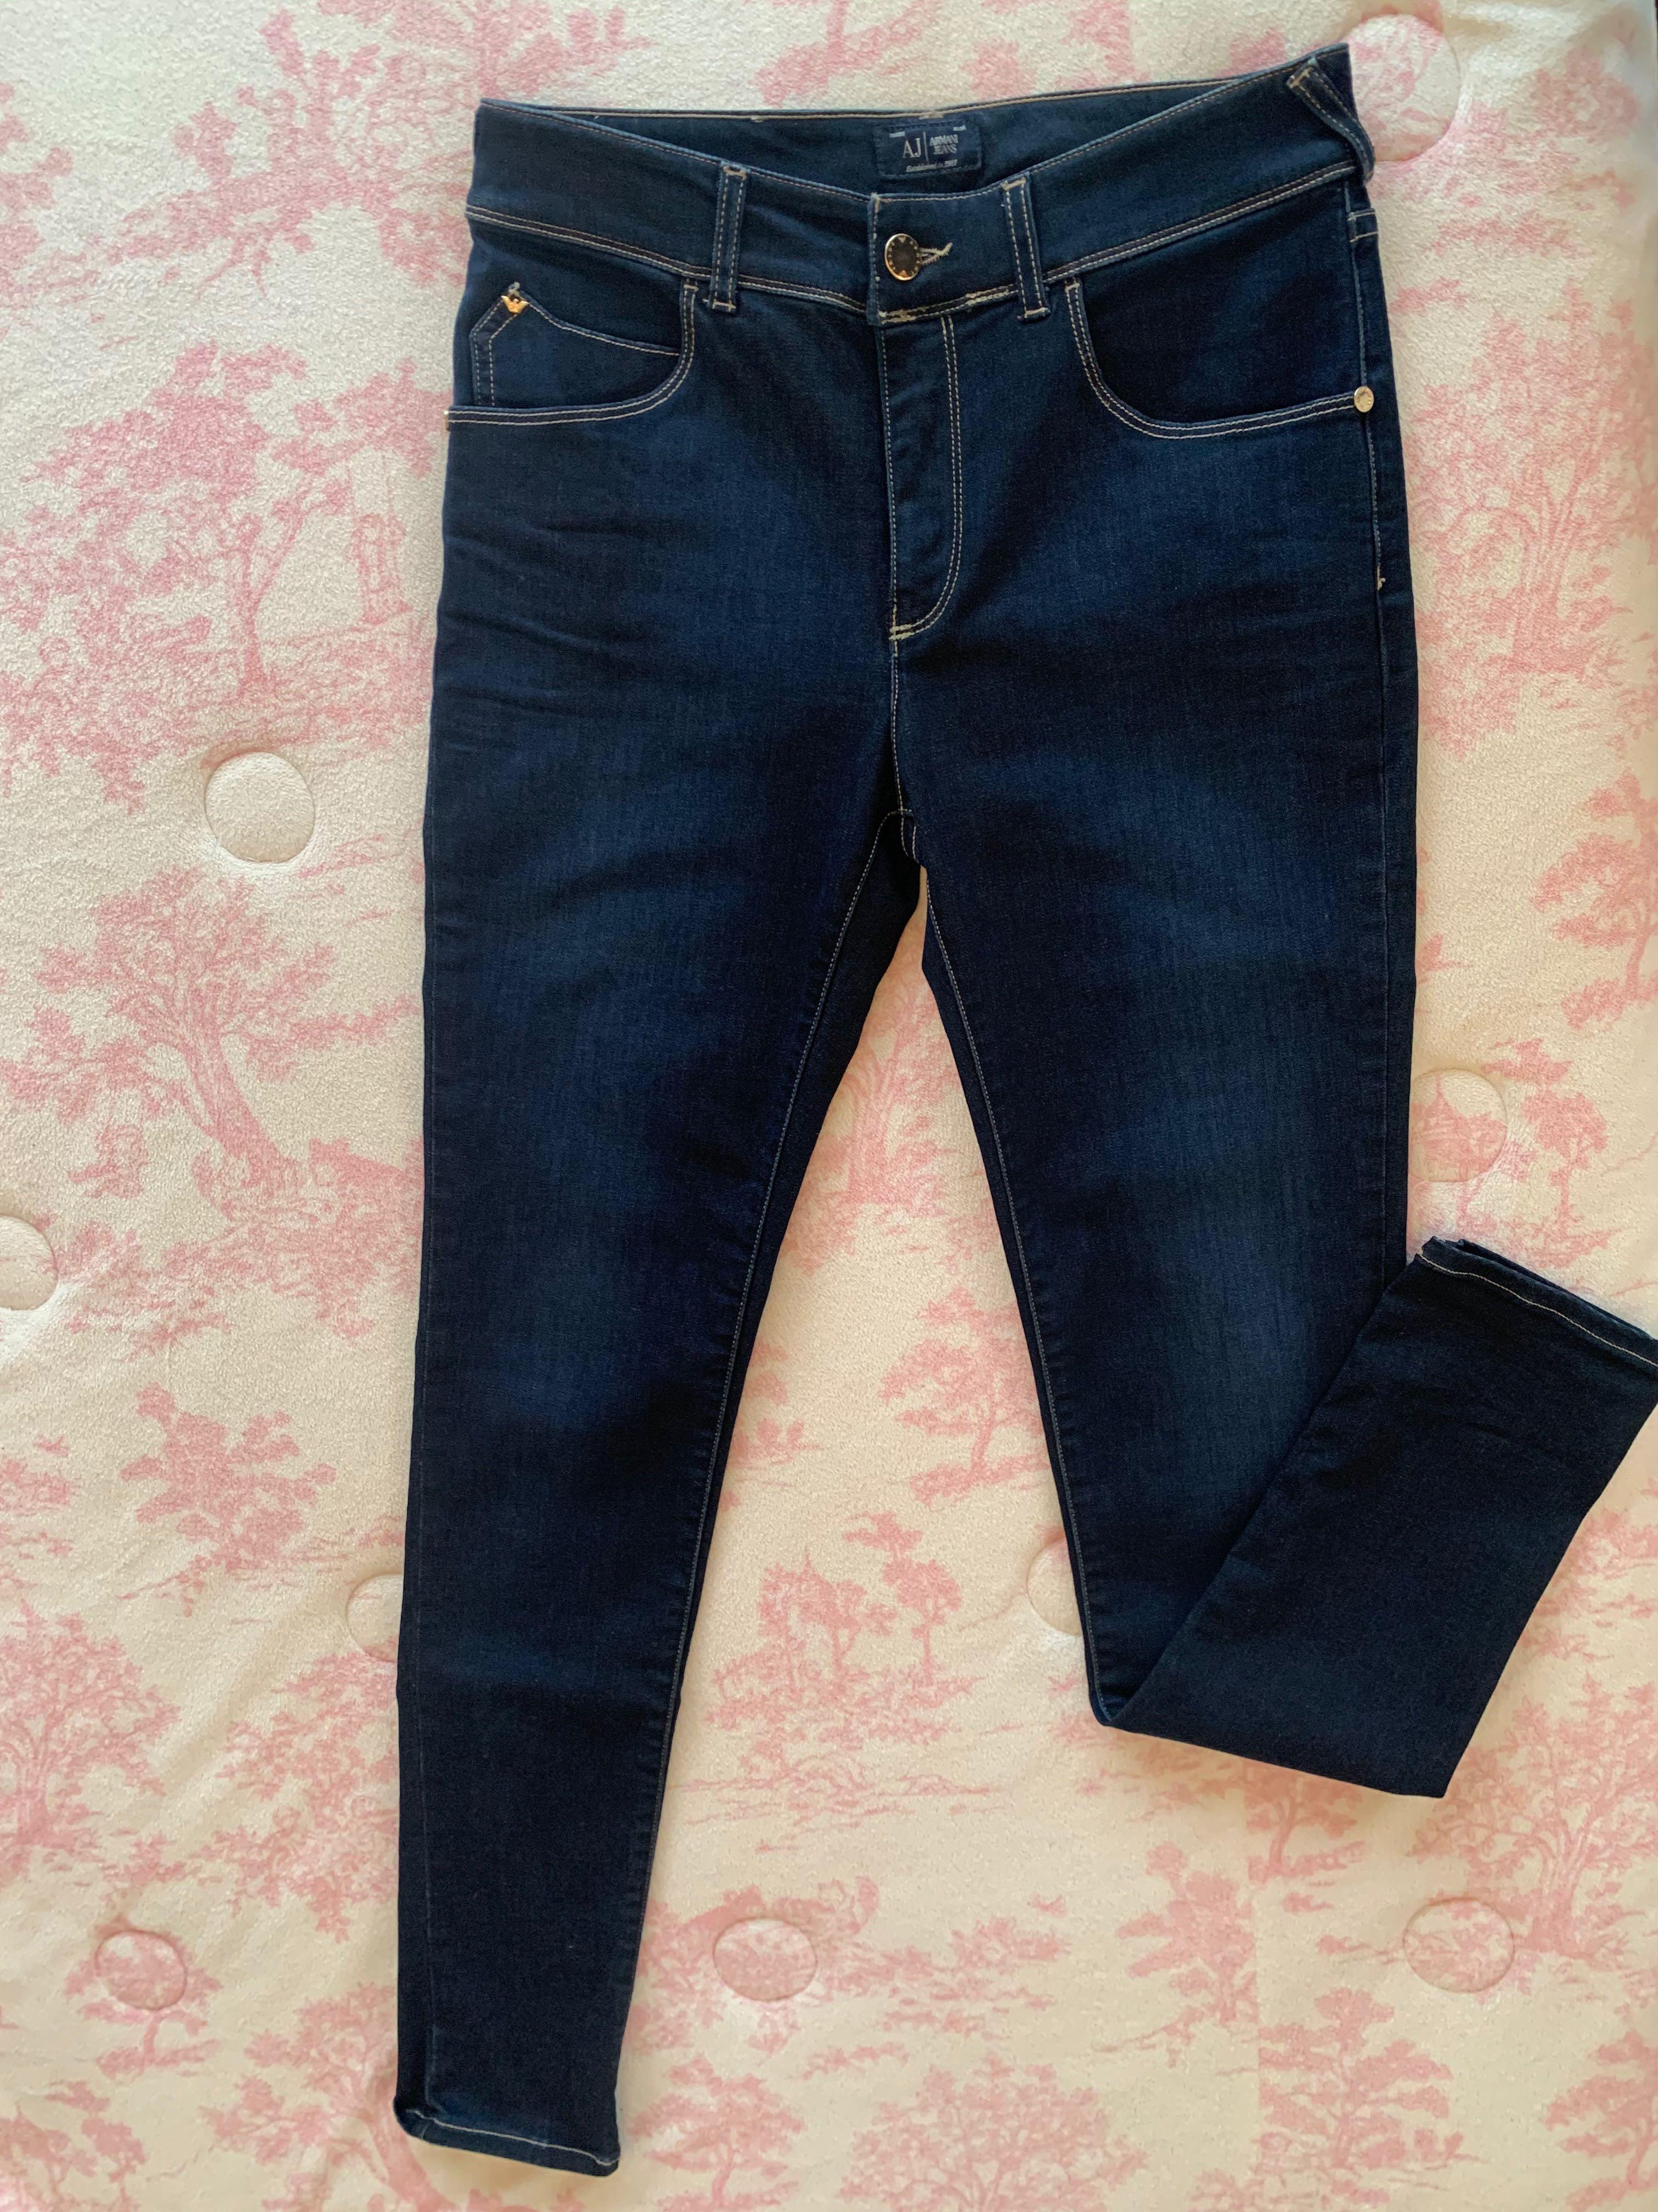 Brand New Armani Jeans